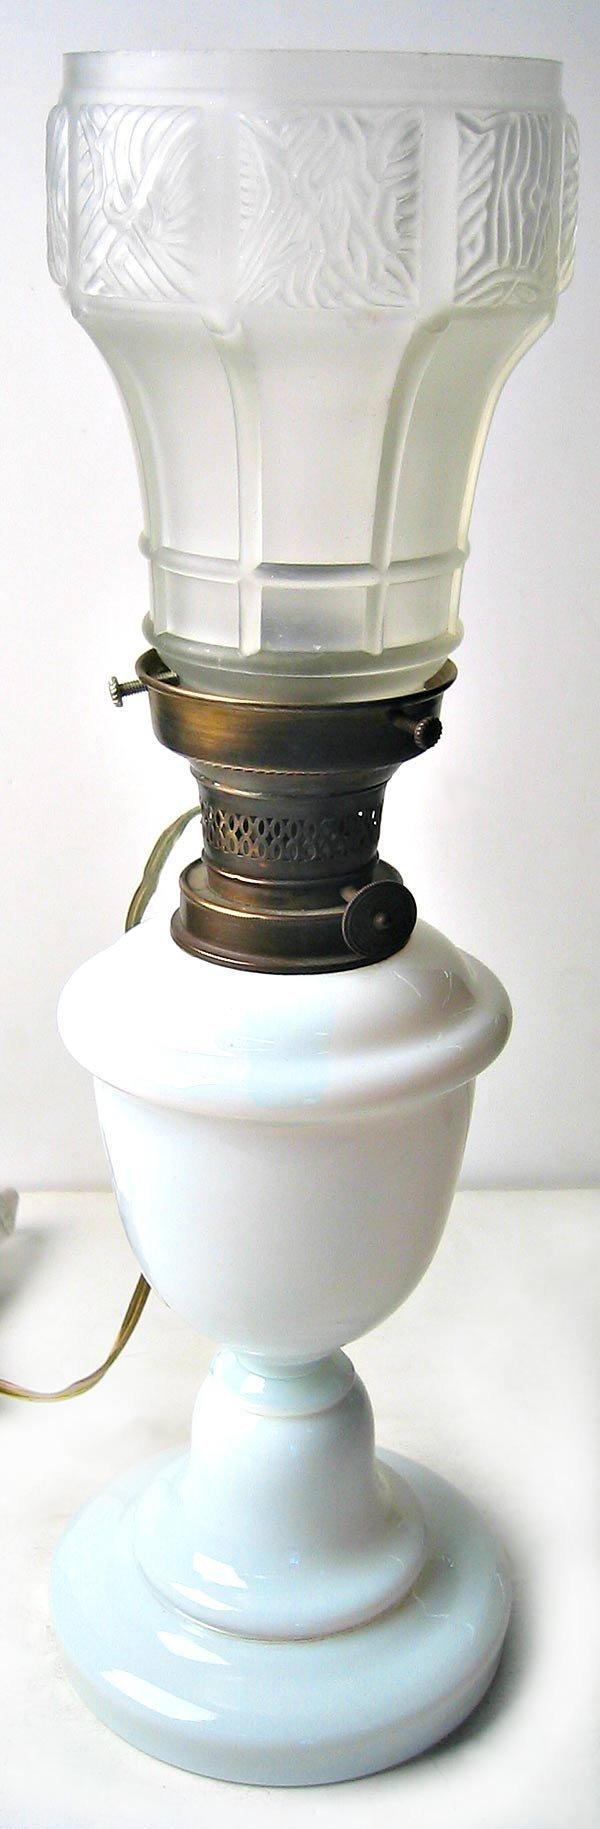 2973: Milk glass table lamp